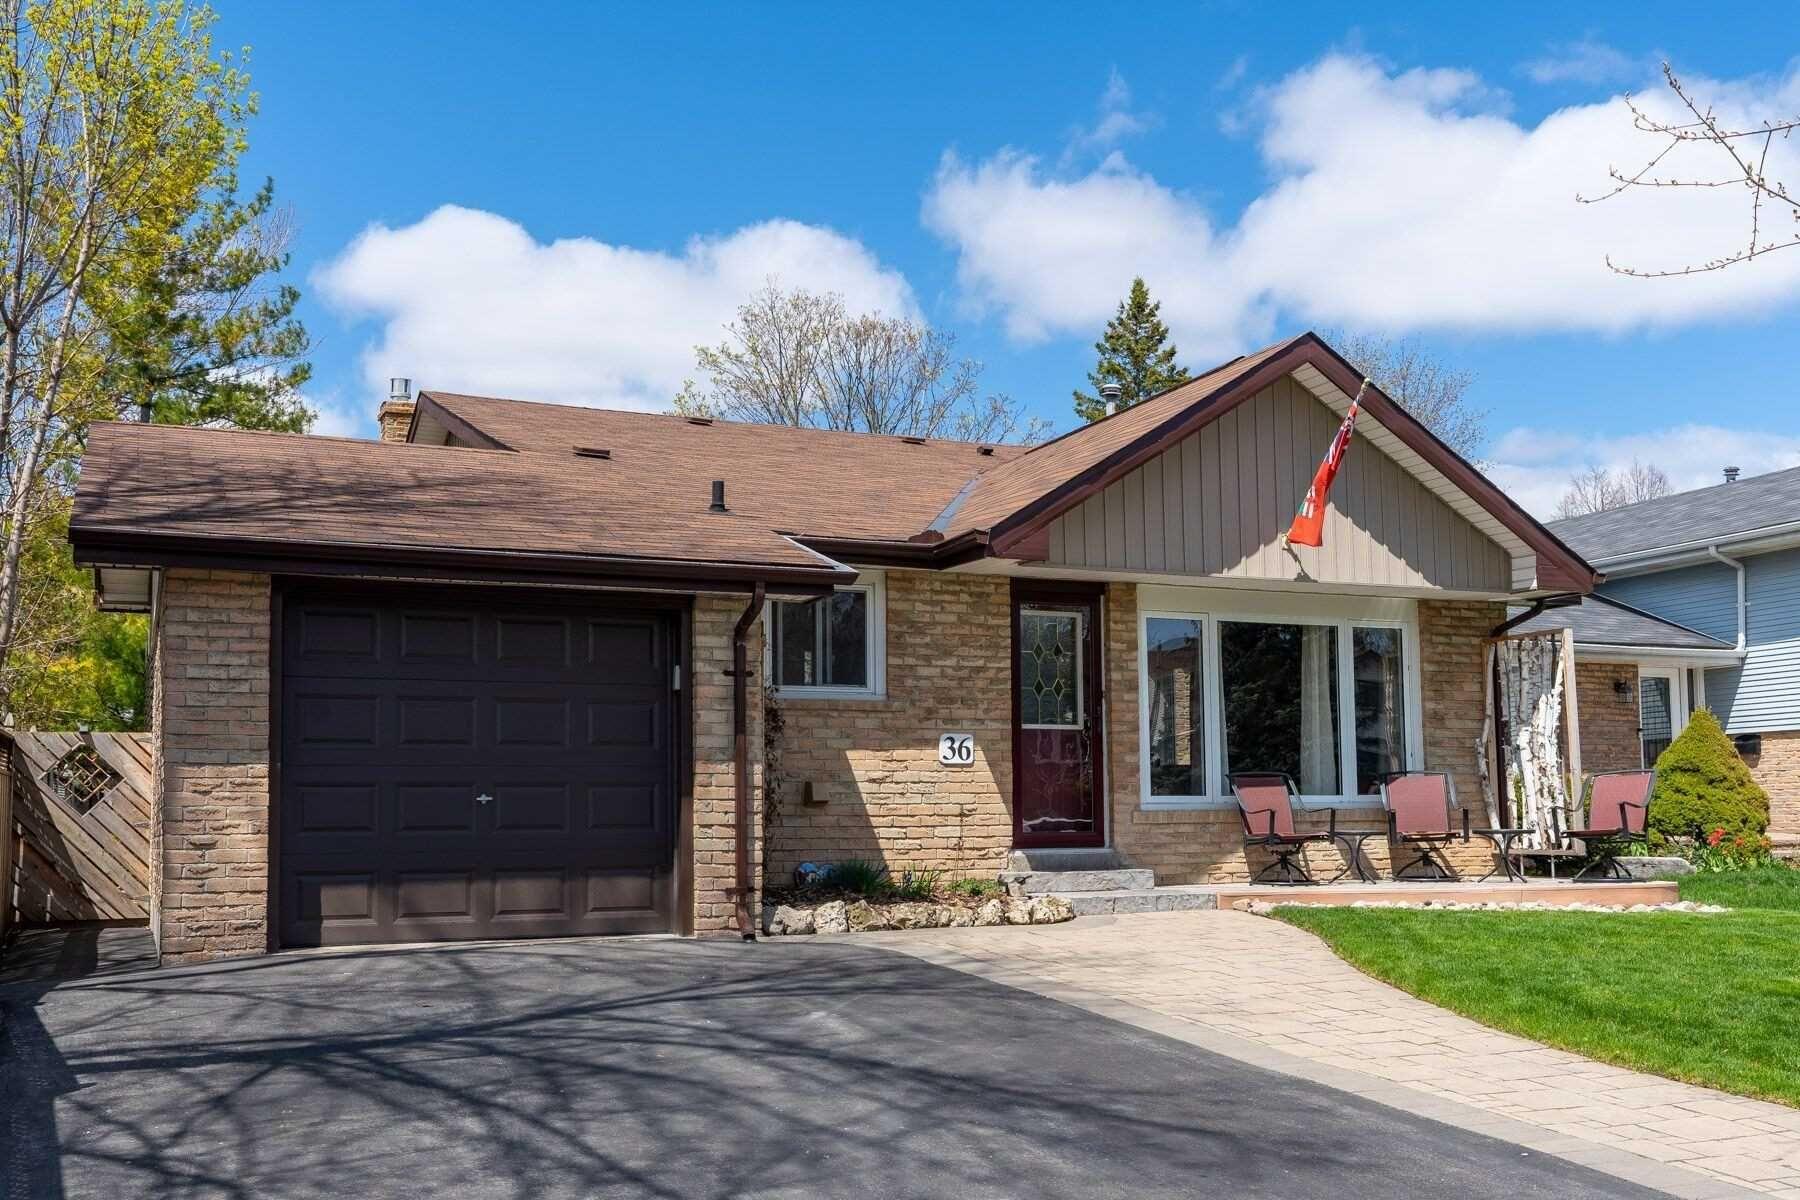 Main Photo: 36 Pilkington Crescent in Whitby: Pringle Creek House (Backsplit 4) for sale : MLS®# E4756440